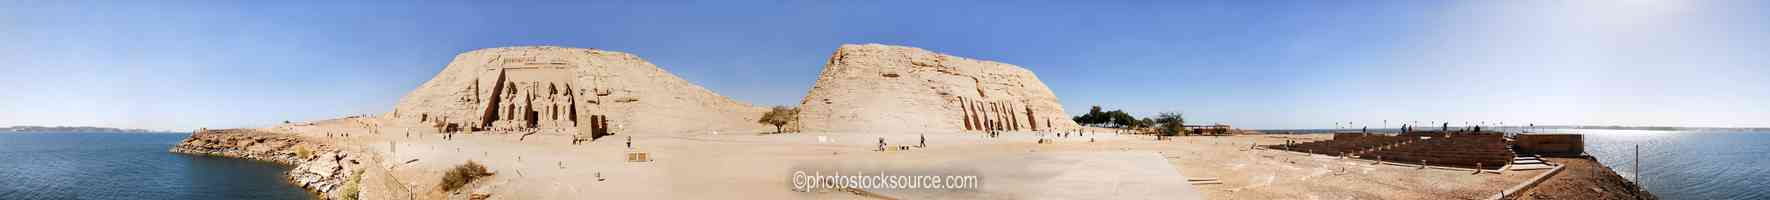 Abu Simbel and Hathor Temples